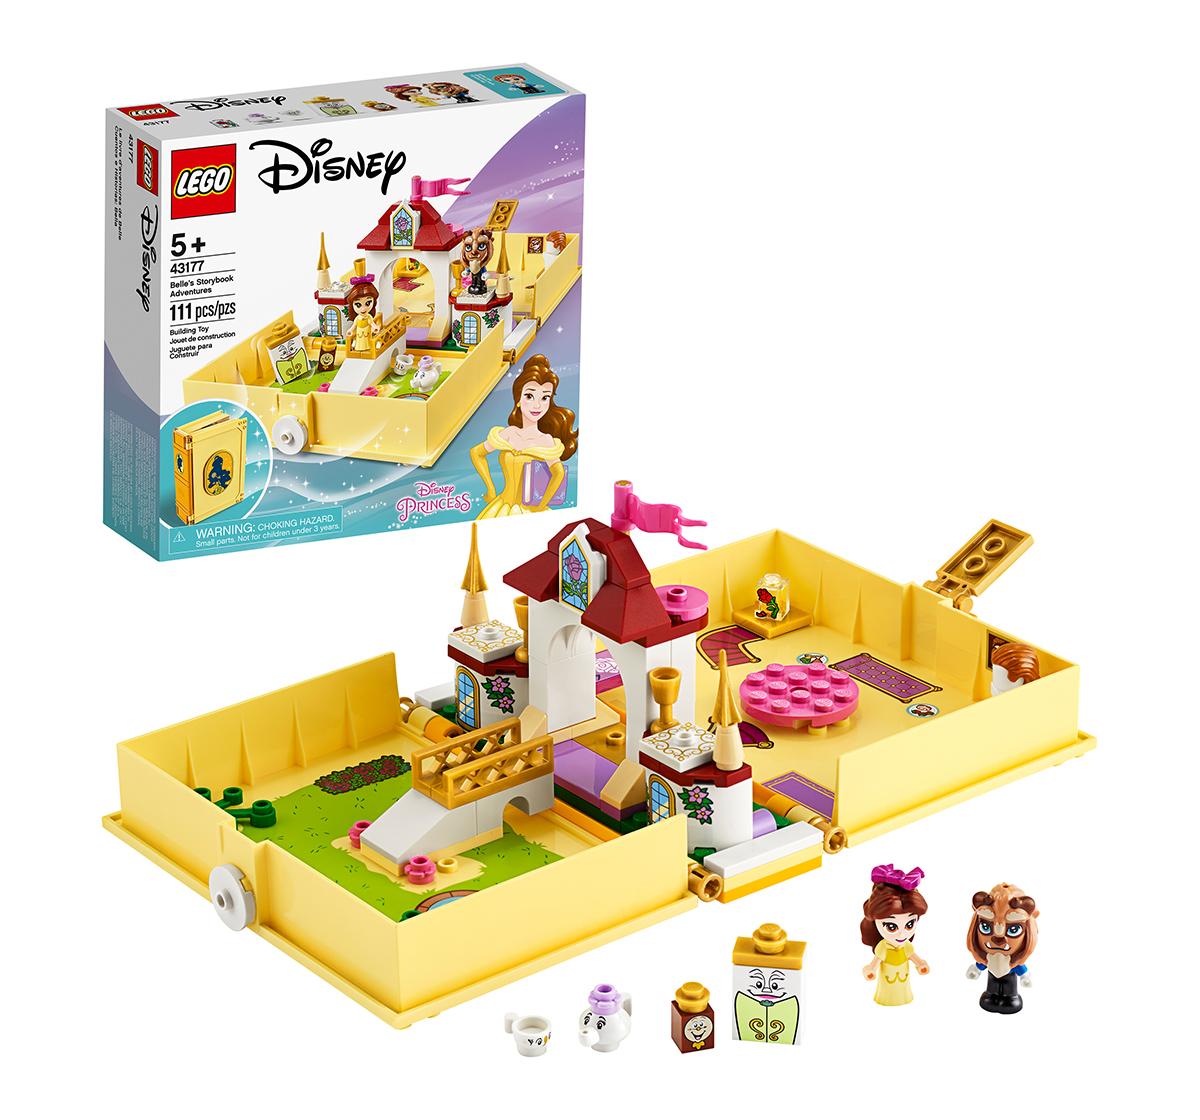 LEGO   LEGO 43177 Belle's Storybook Adventures Lego Blocks for Girls age 5Y+